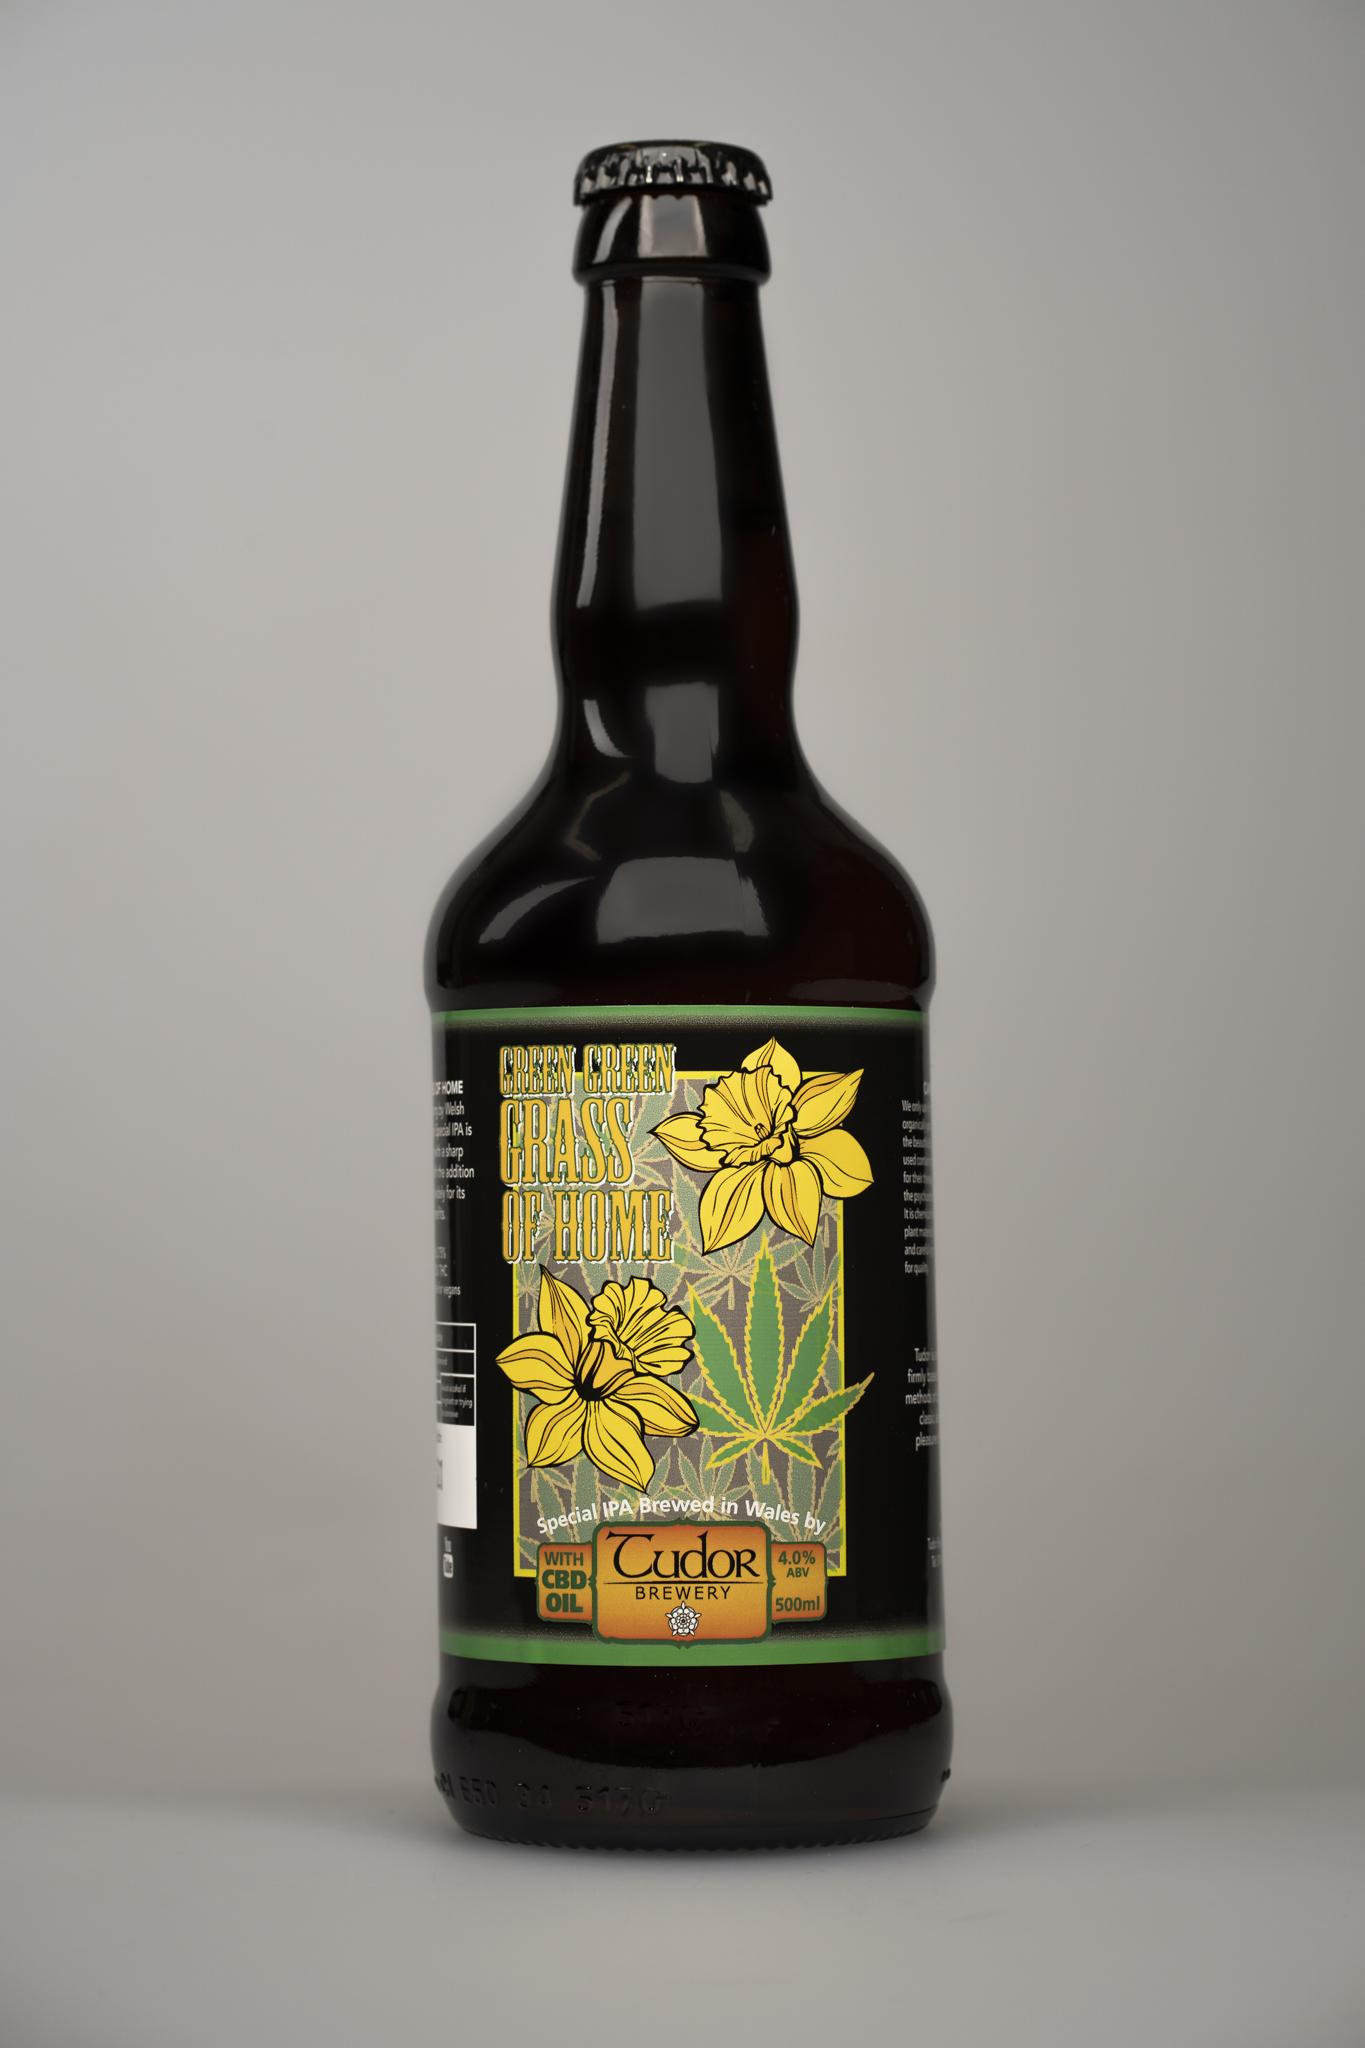 Tudor Brewery Specials